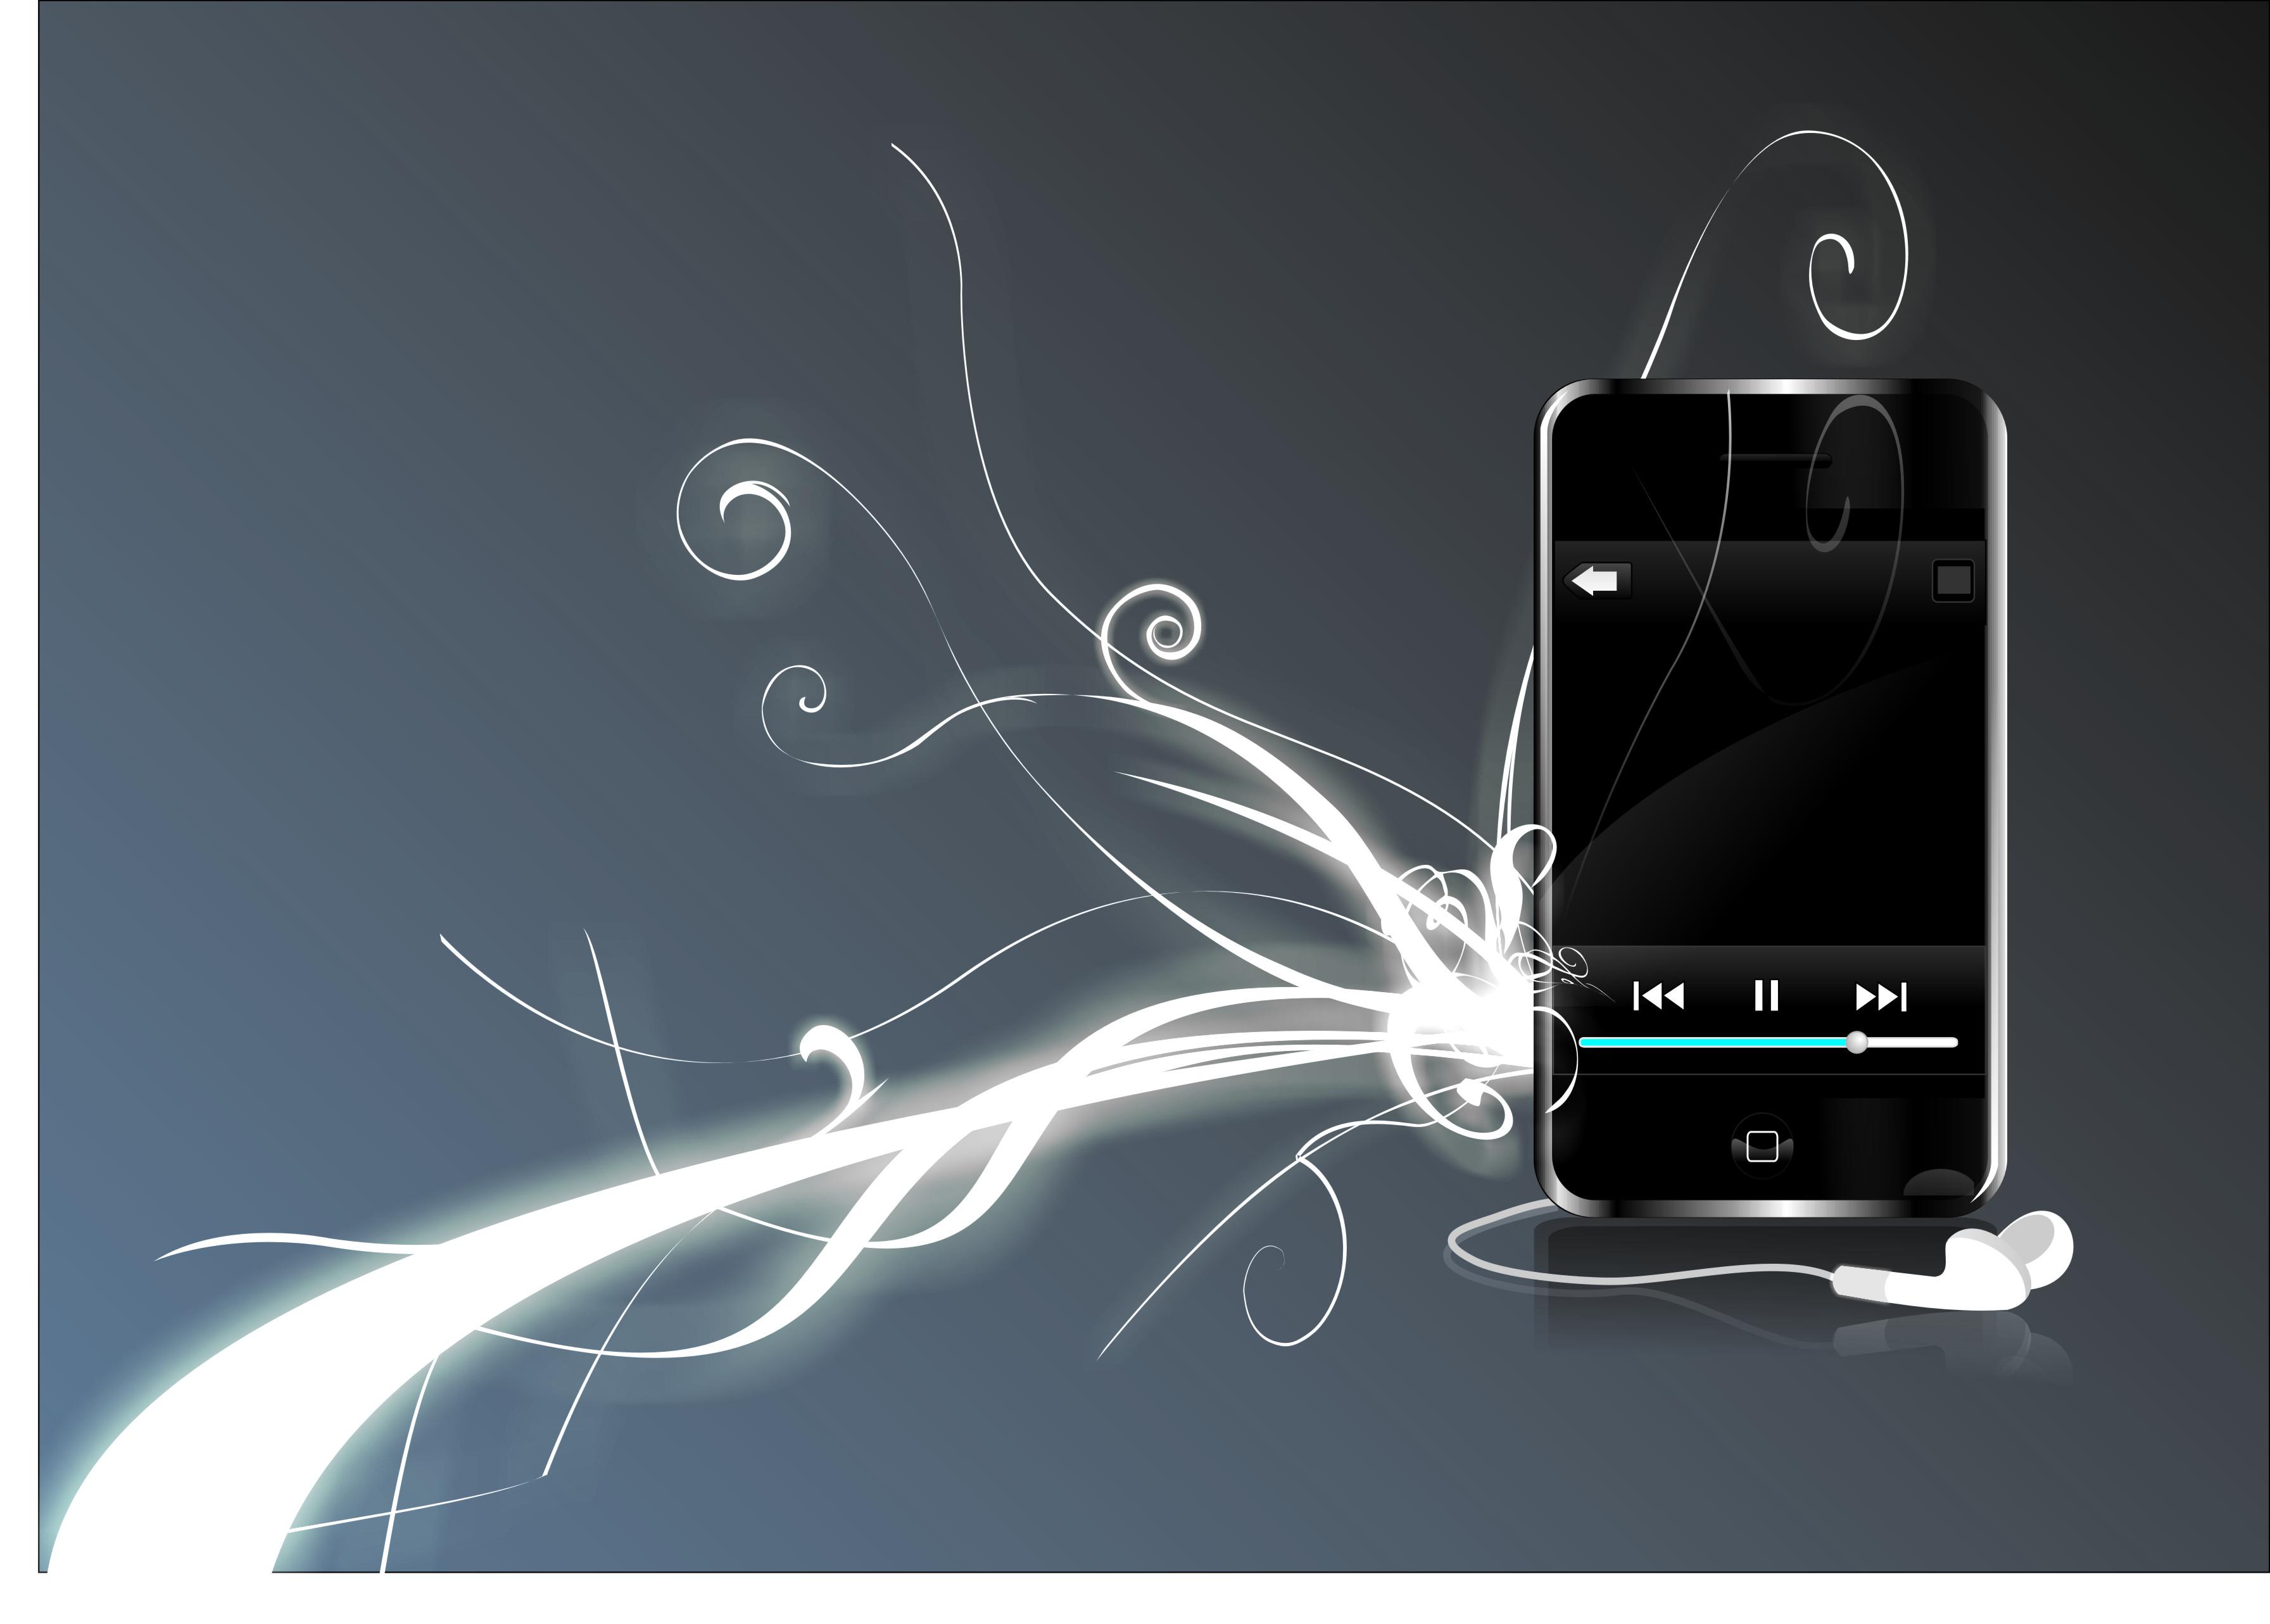 мобильники картинки и обои холодное